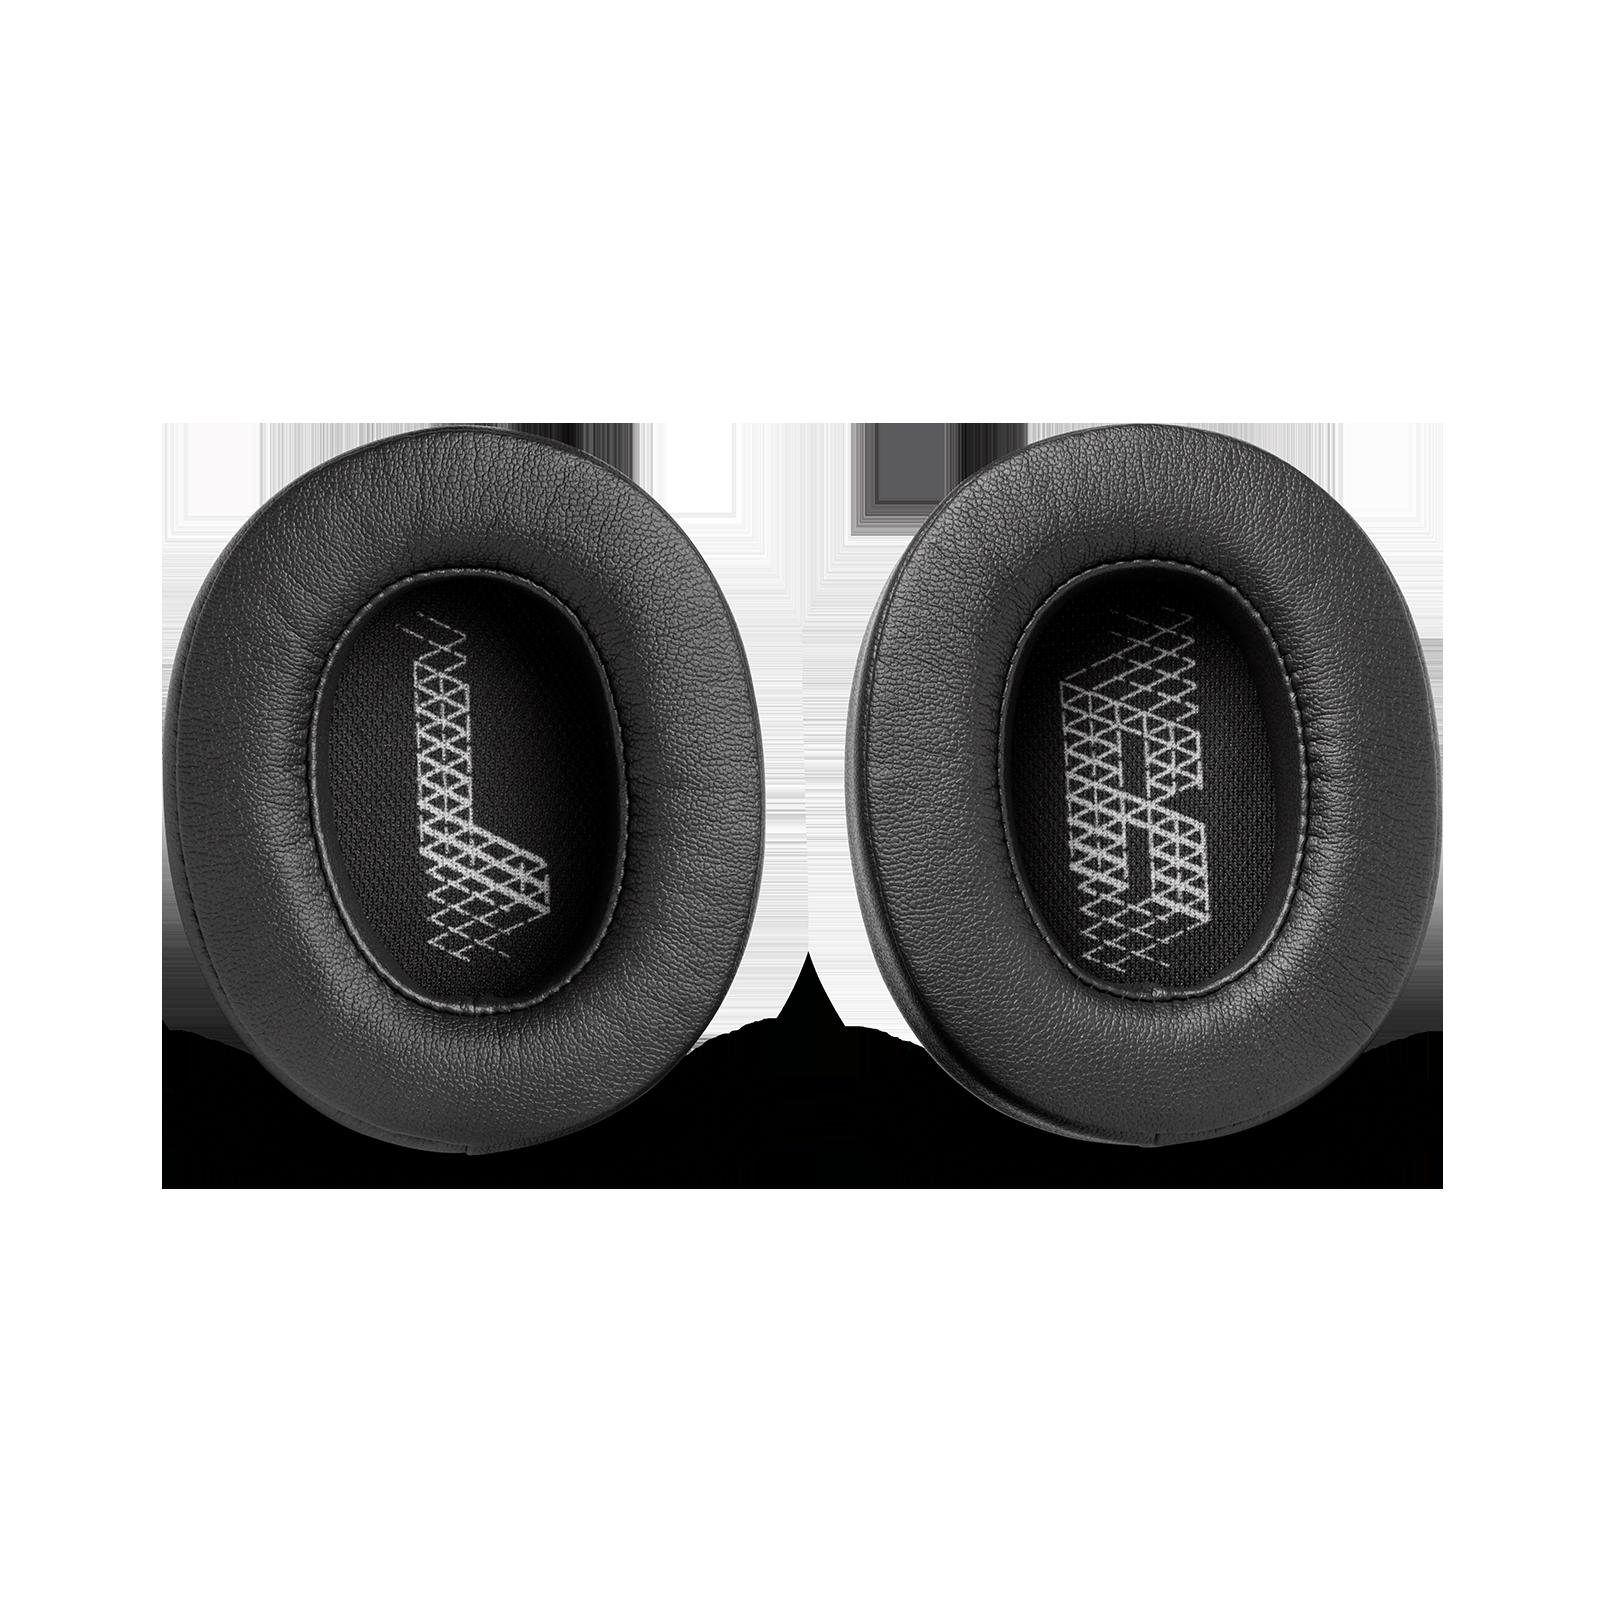 JBL Ear pads for Live 500 - Black - Ear pads (L+R) - Hero